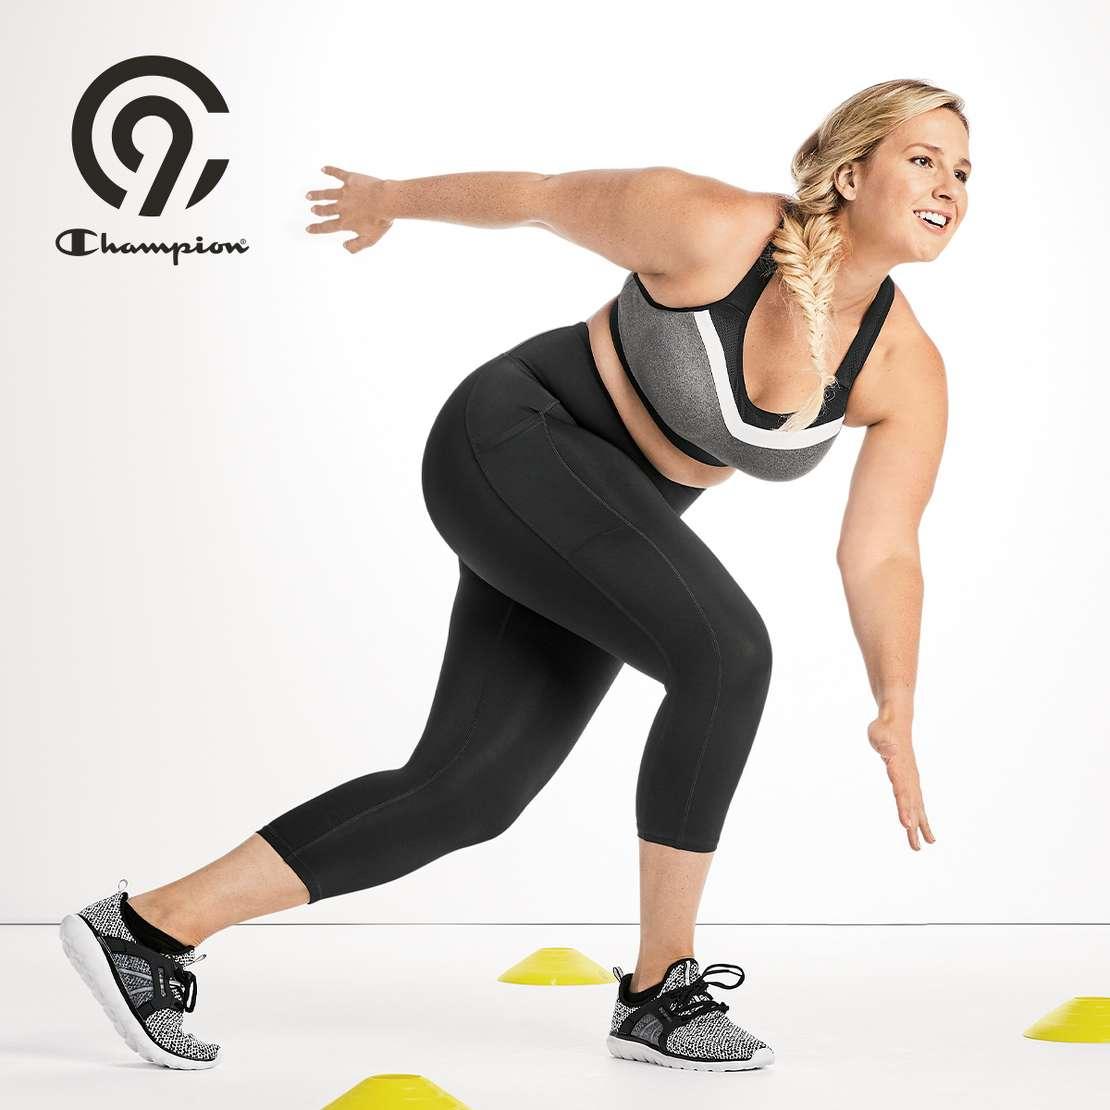 consonante pánico prueba  reebok plus size workout clothes Online Shopping for Women, Men, Kids  Fashion & Lifestyle|Free Delivery & Returns! -